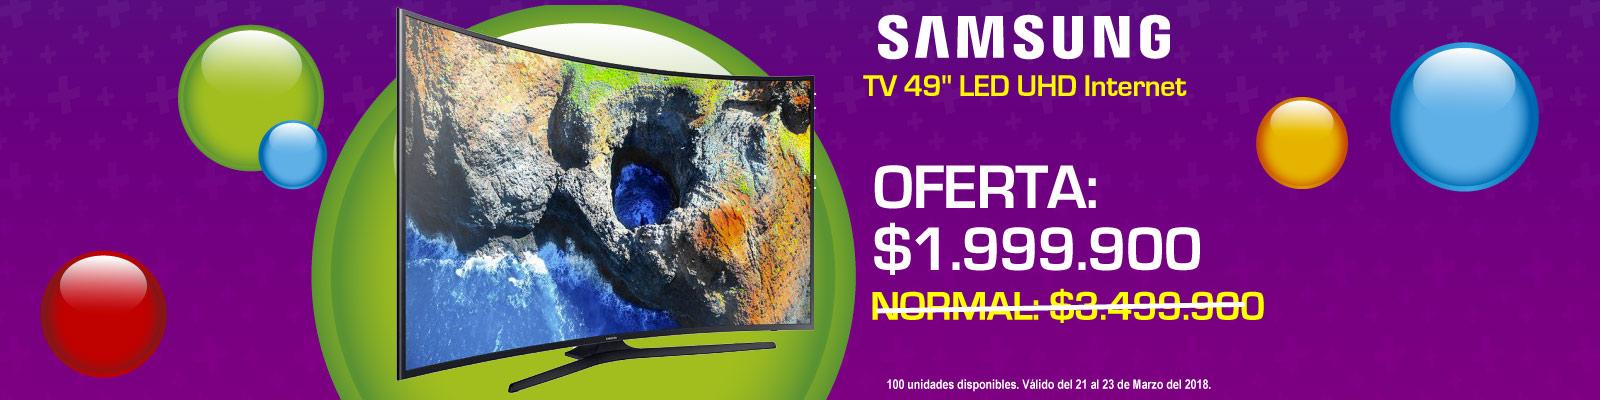 TOP PROMO ALKP-1-TV-TV 49 124cm SAMSUNG LED 49MU6300 UHD Internet-prod-Marzo21-23